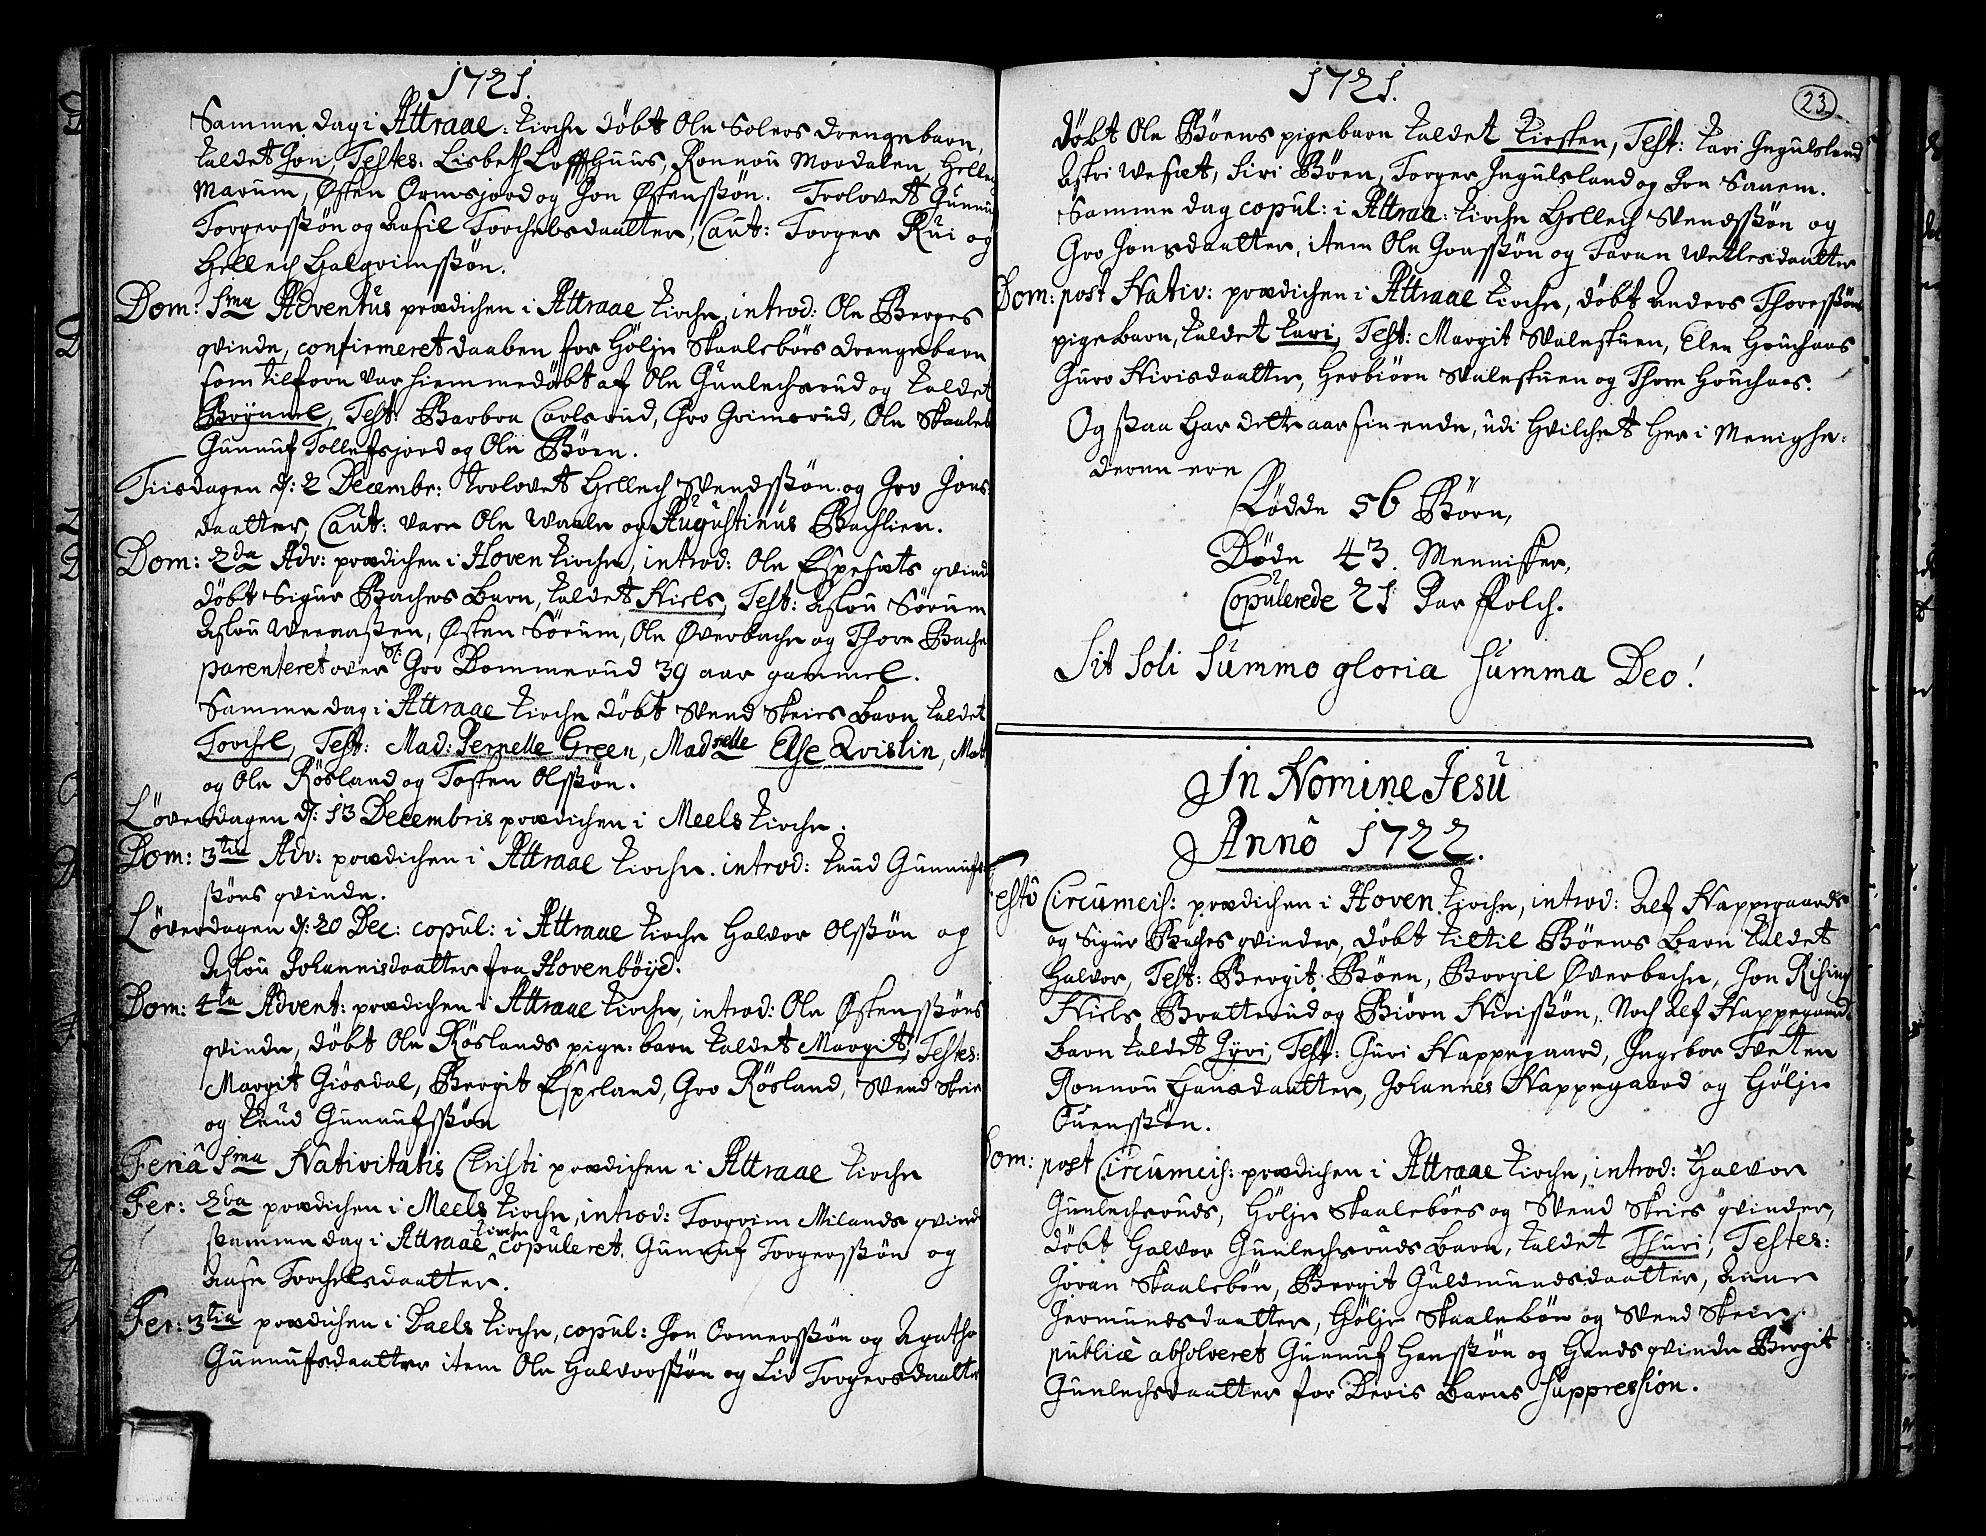 SAKO, Tinn kirkebøker, F/Fa/L0001: Ministerialbok nr. I 1, 1717-1734, s. 23